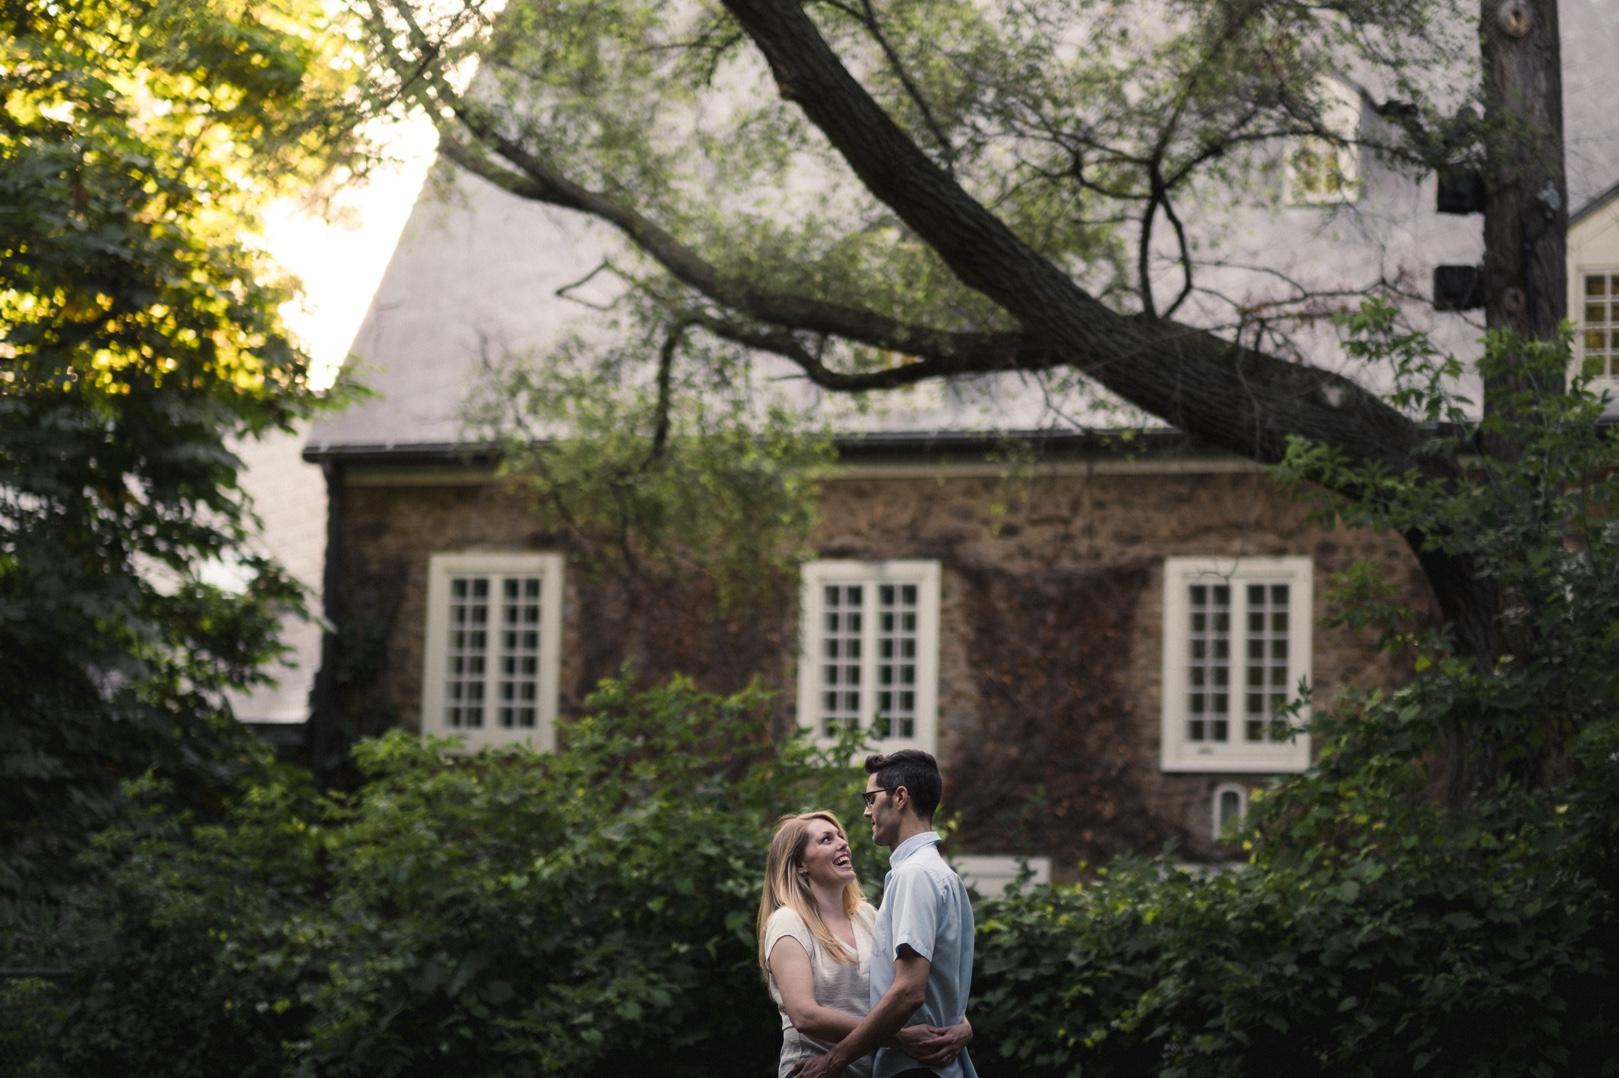 50_ELIZ AND ALEX-272_Events_Weddings_2018_Travel_Engagement_Photography_best_Portraits.jpg